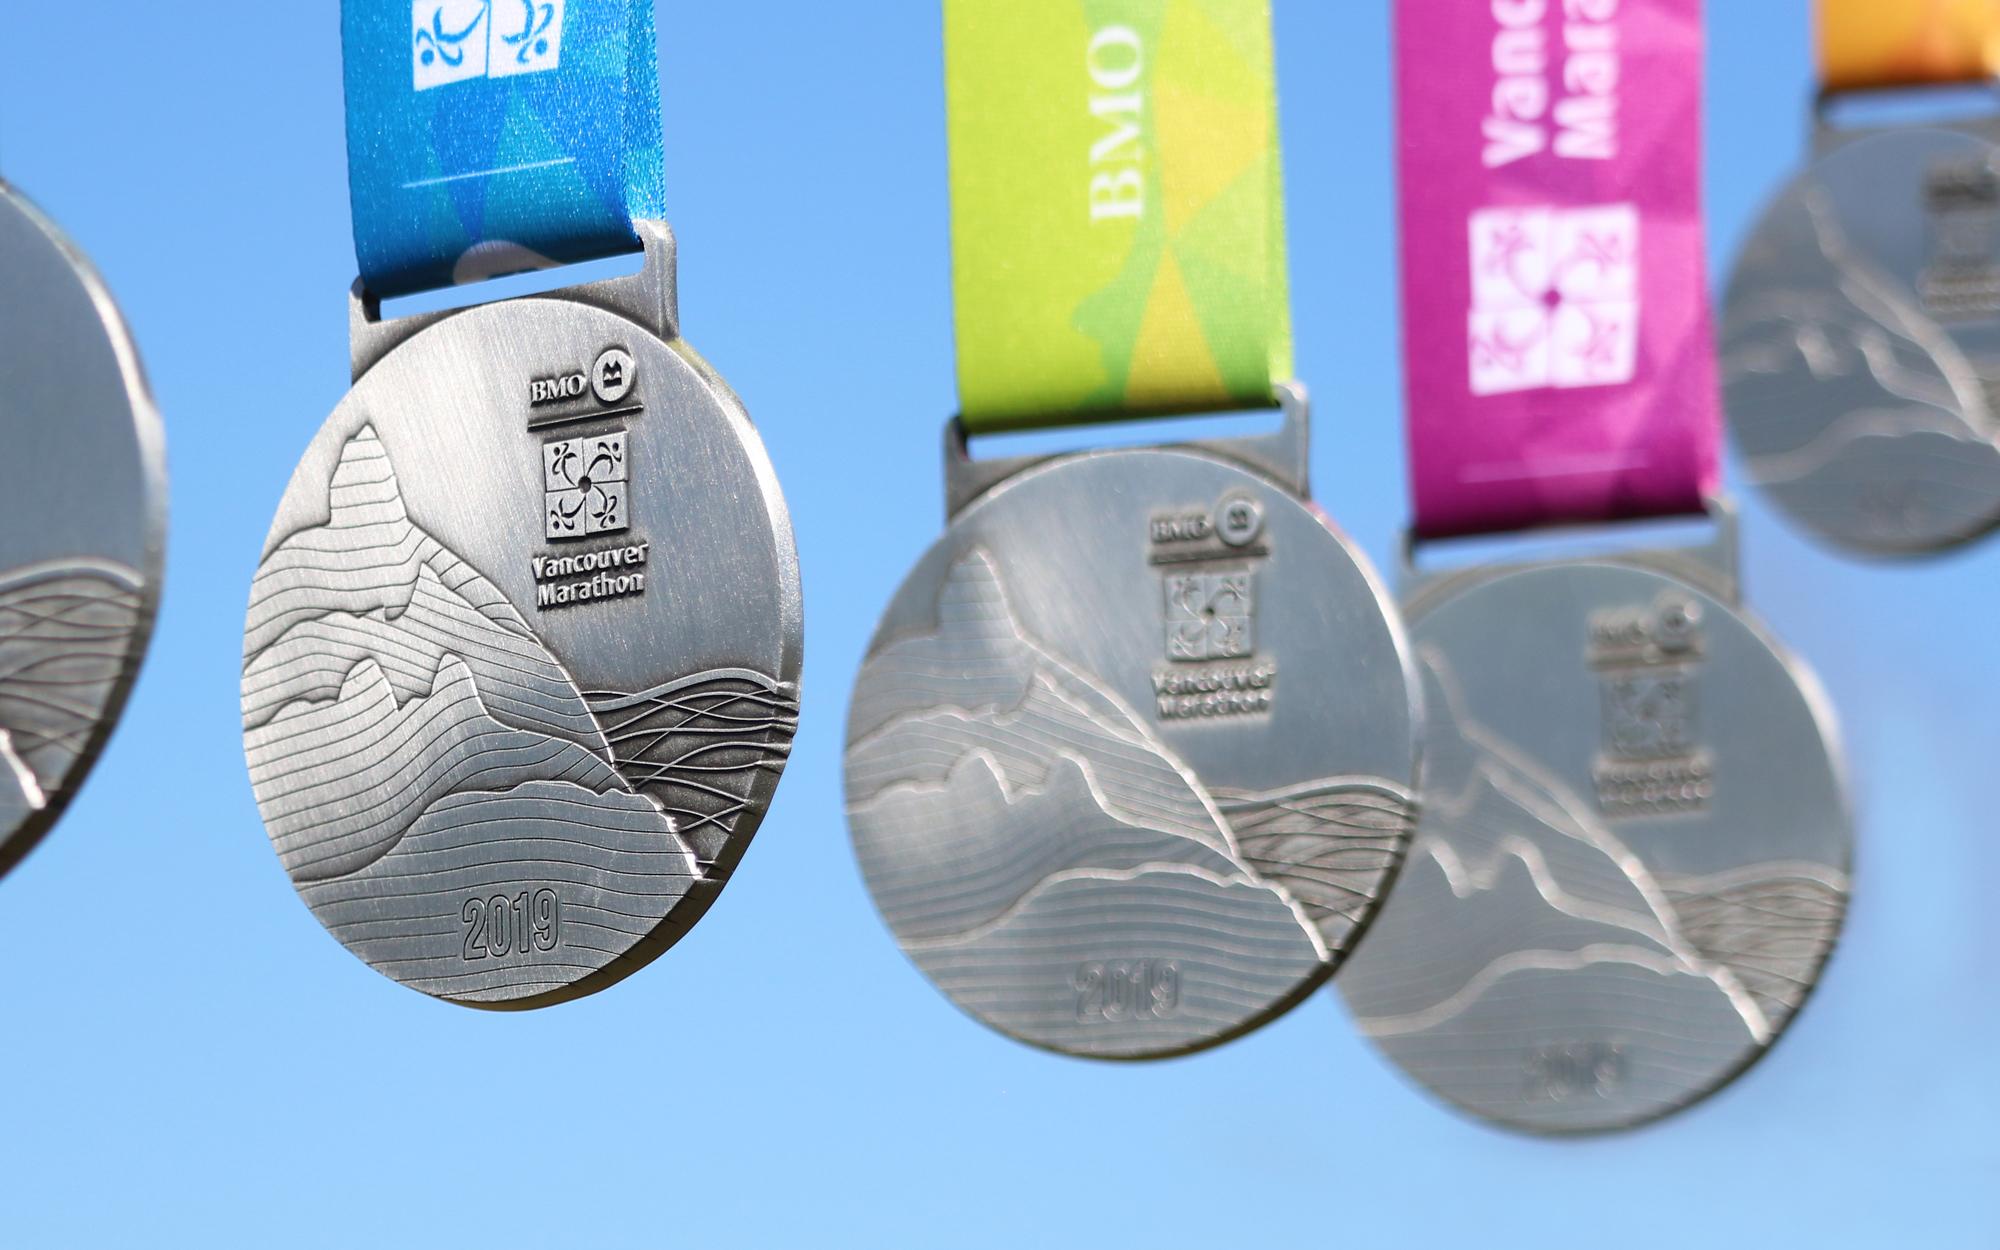 2019.M.BMOVM.Medals-IMG_7523-BMO.half-sk-IG-BMOVancouverMarathon-2000x1250px